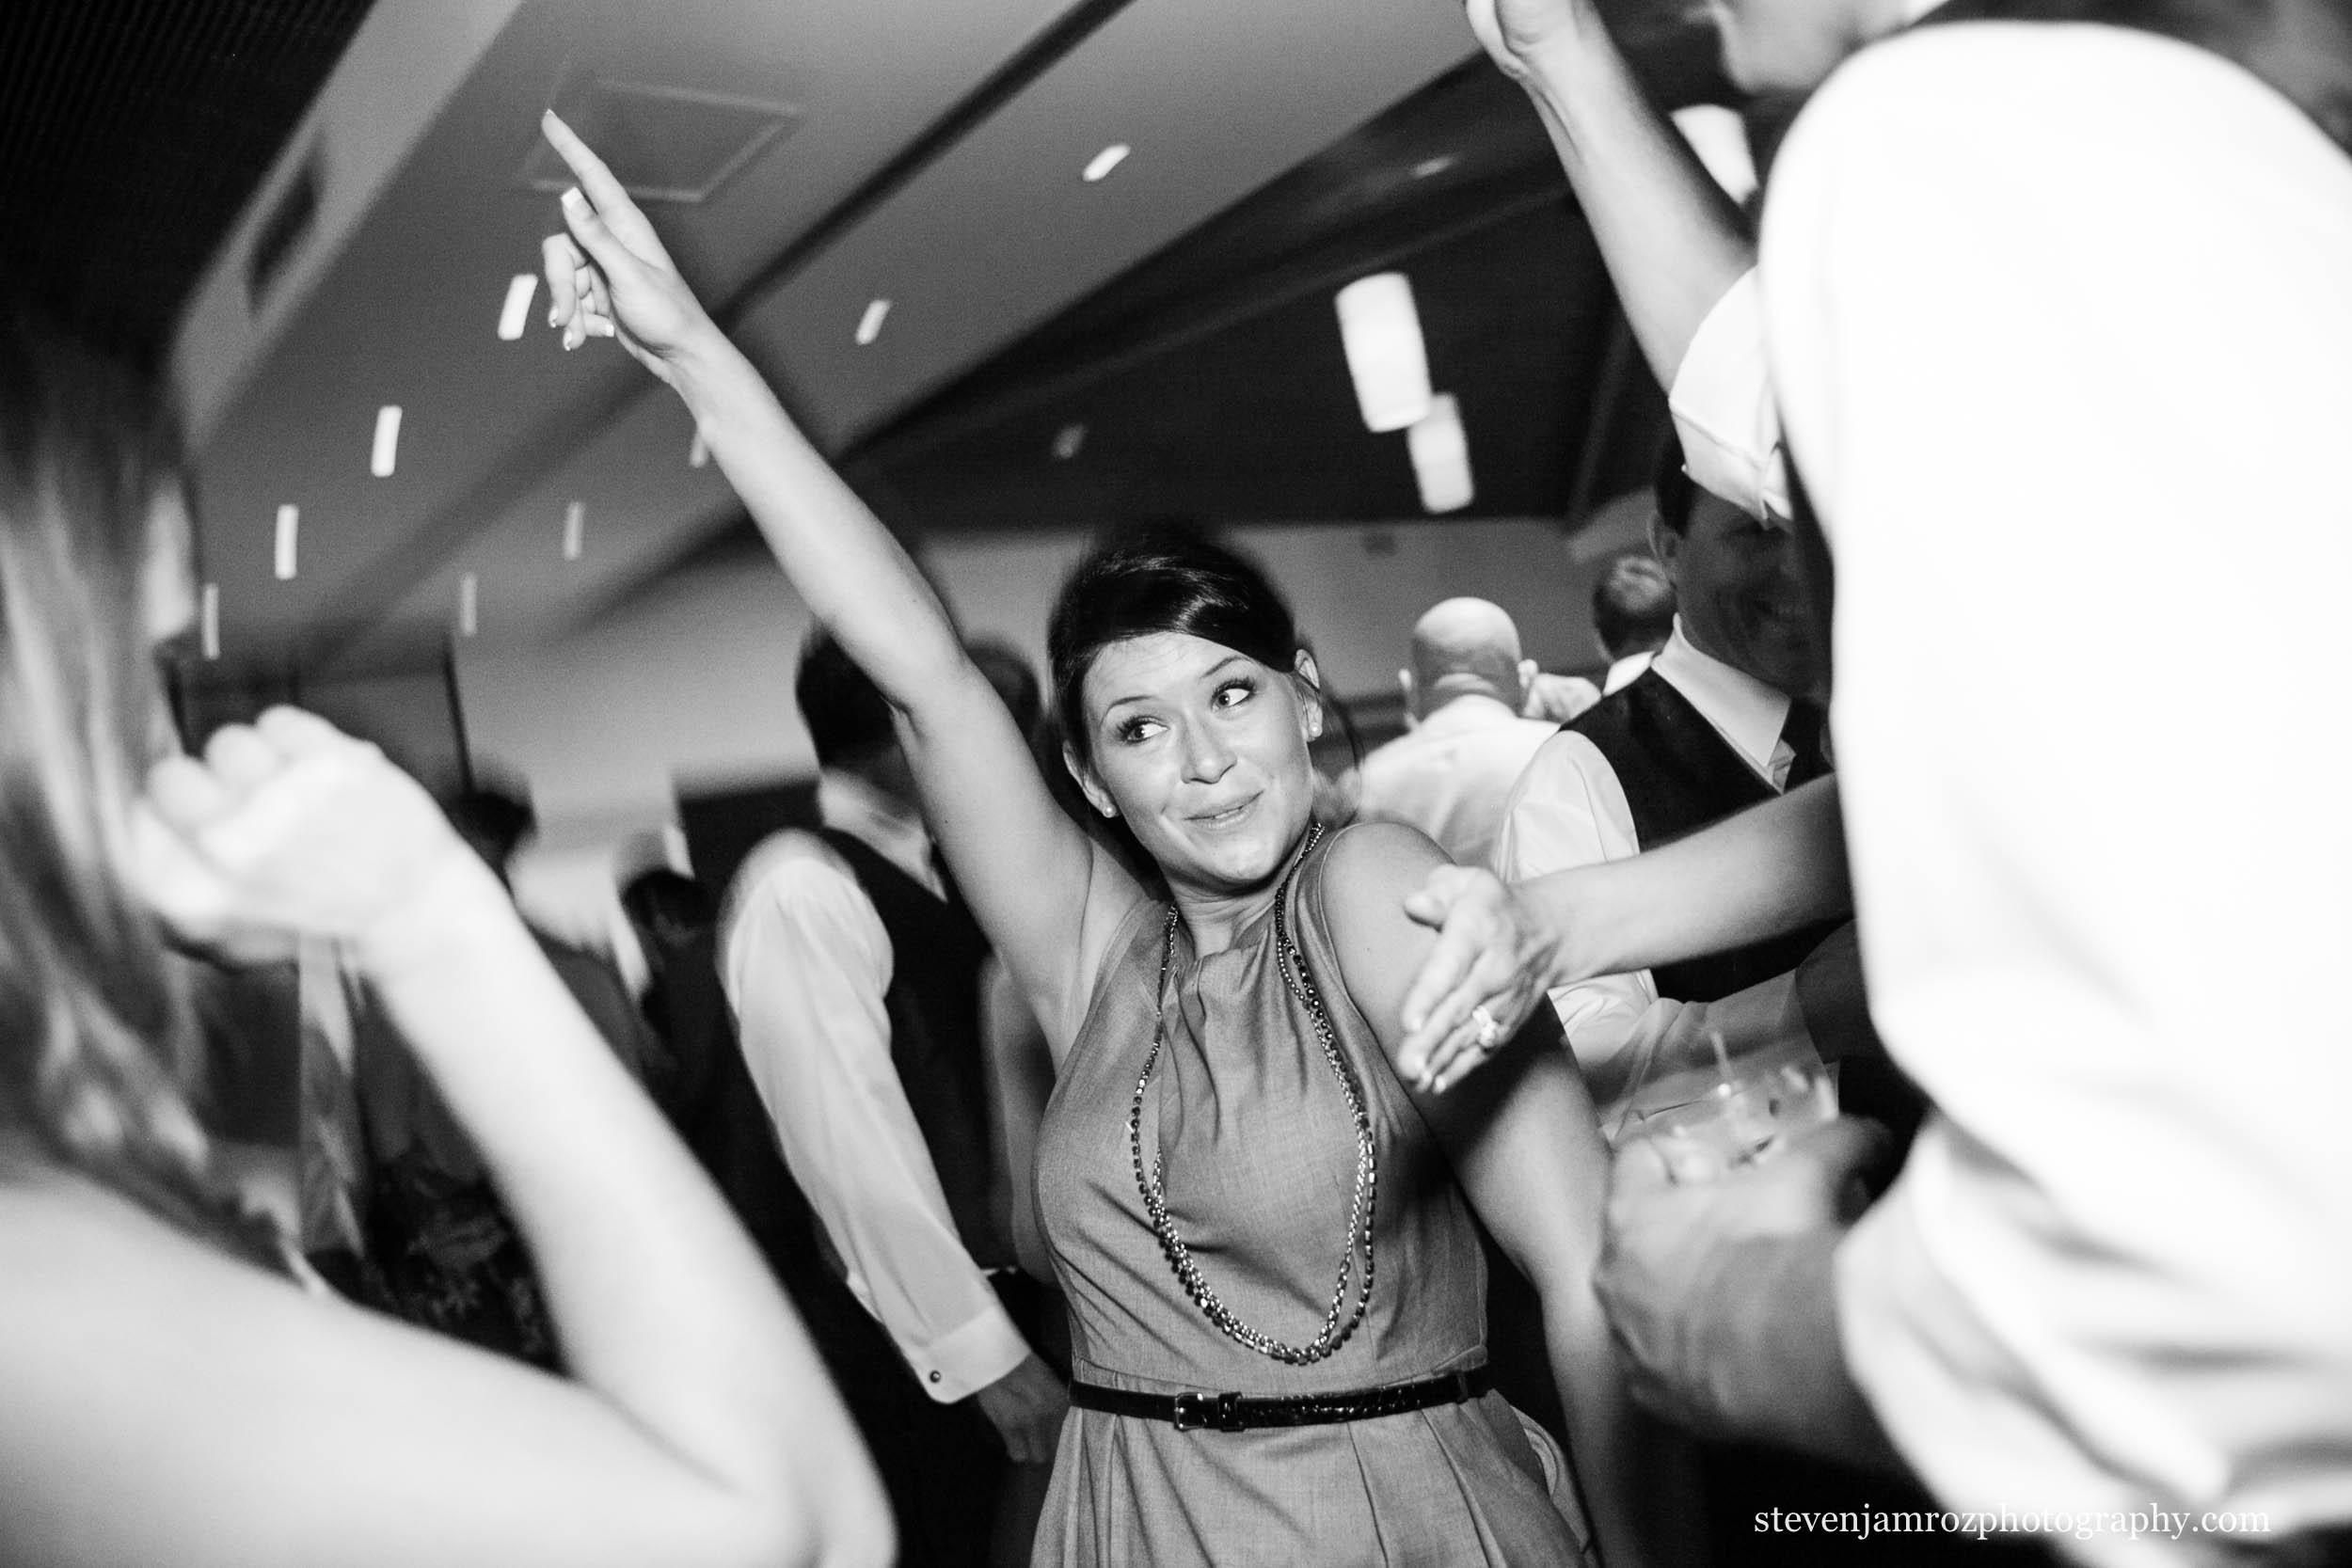 dancing-wedding-nc-steven-jamroz-photography-0192.jpg